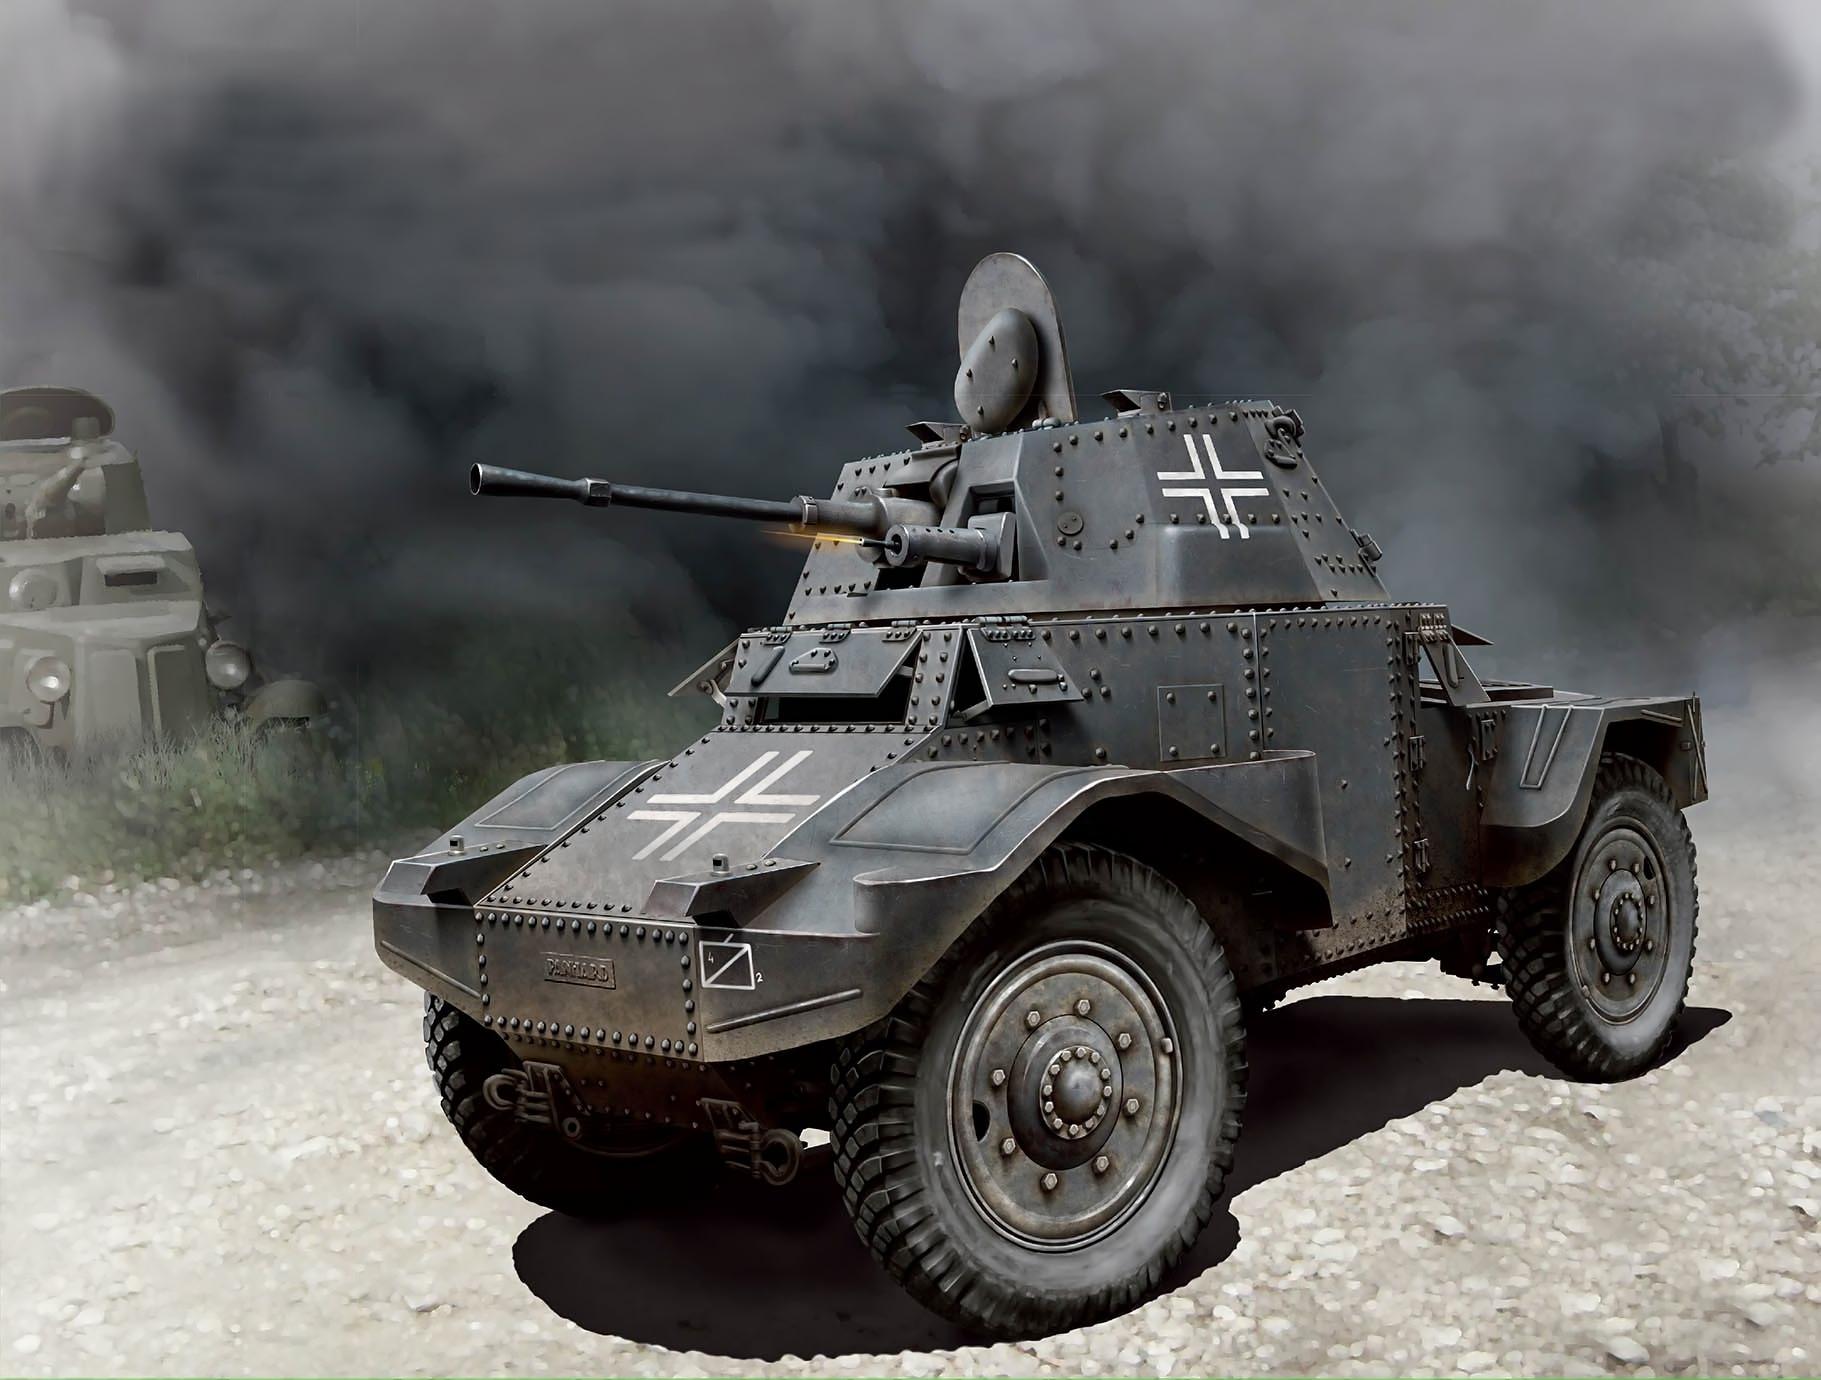 Бут Владимир. Бронеавтомобиль Panhard 178 AMD-35.